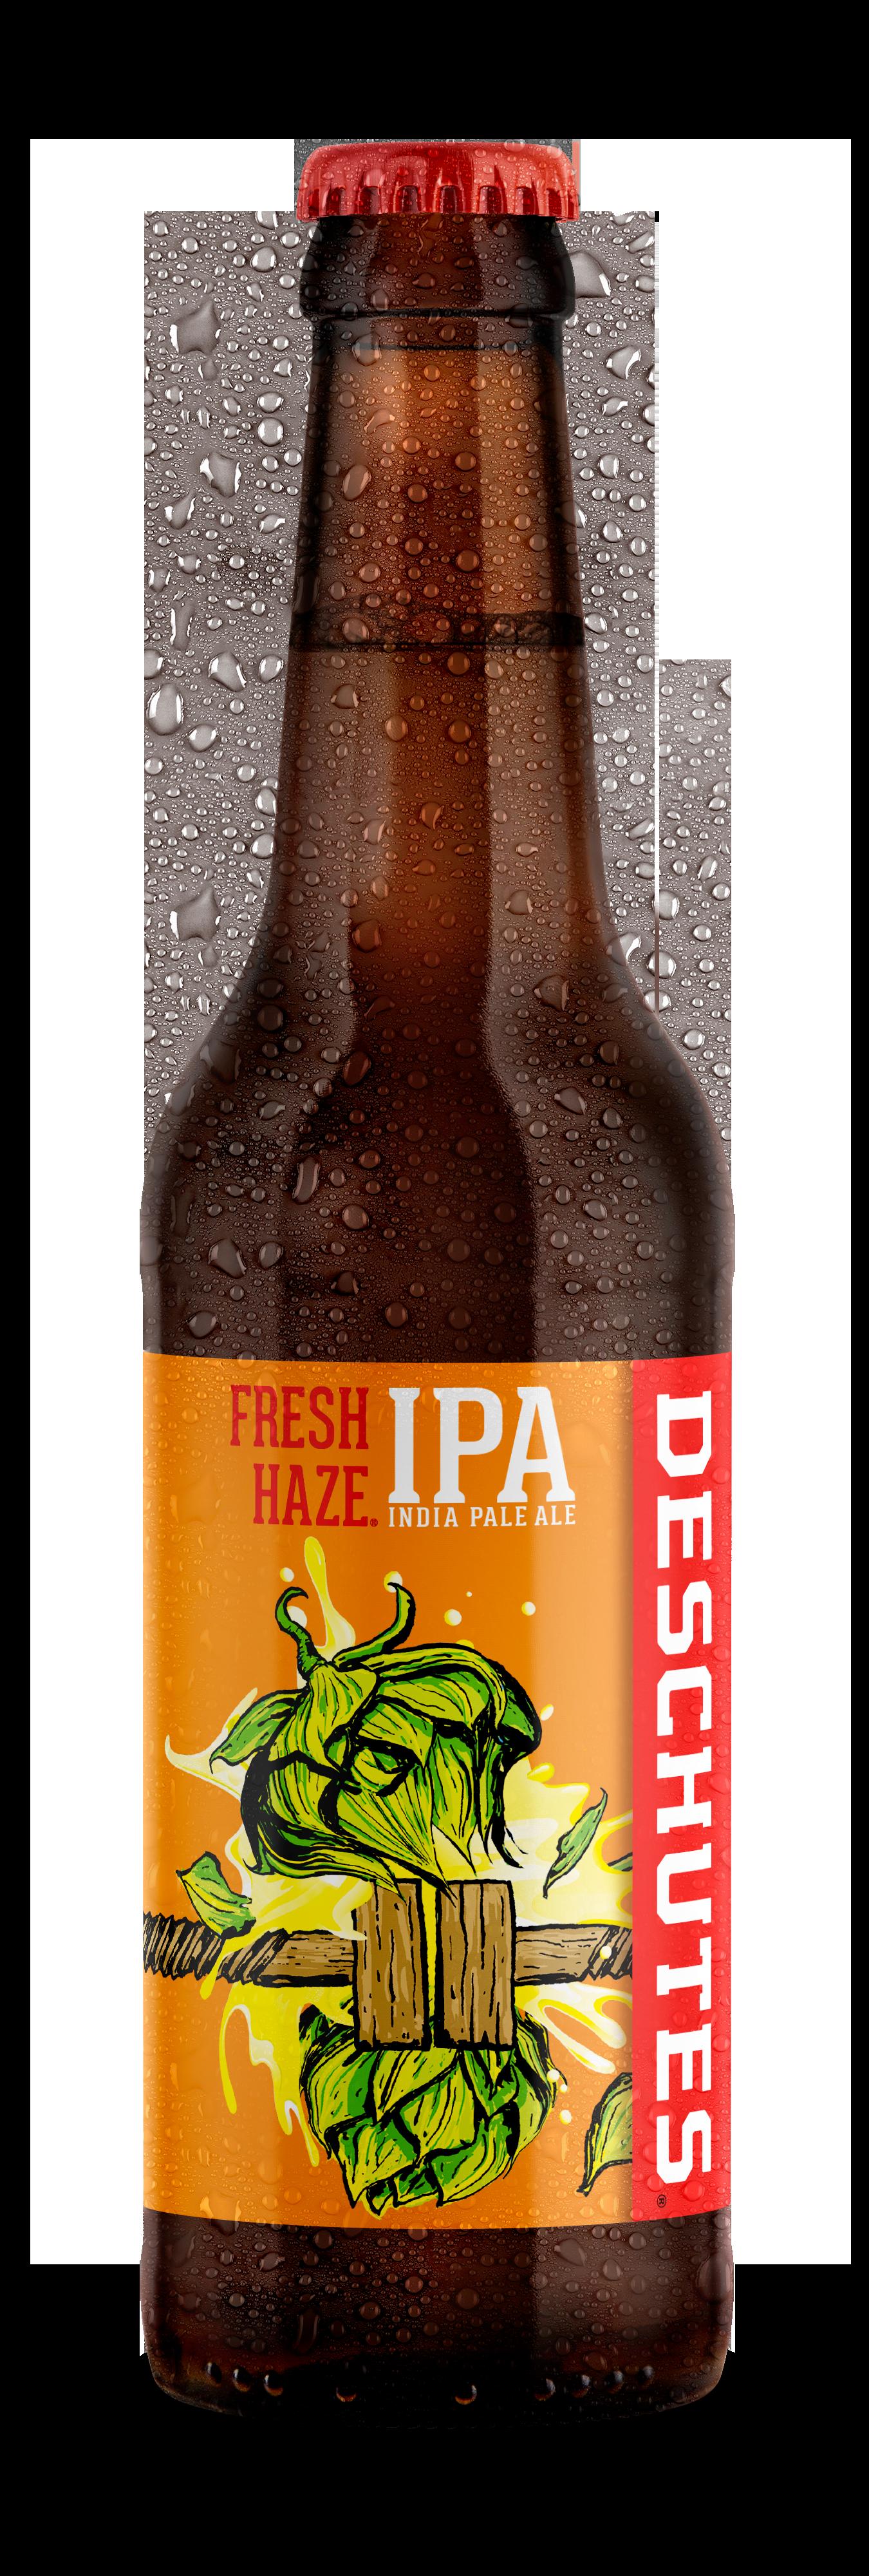 Fresh Haze IPA